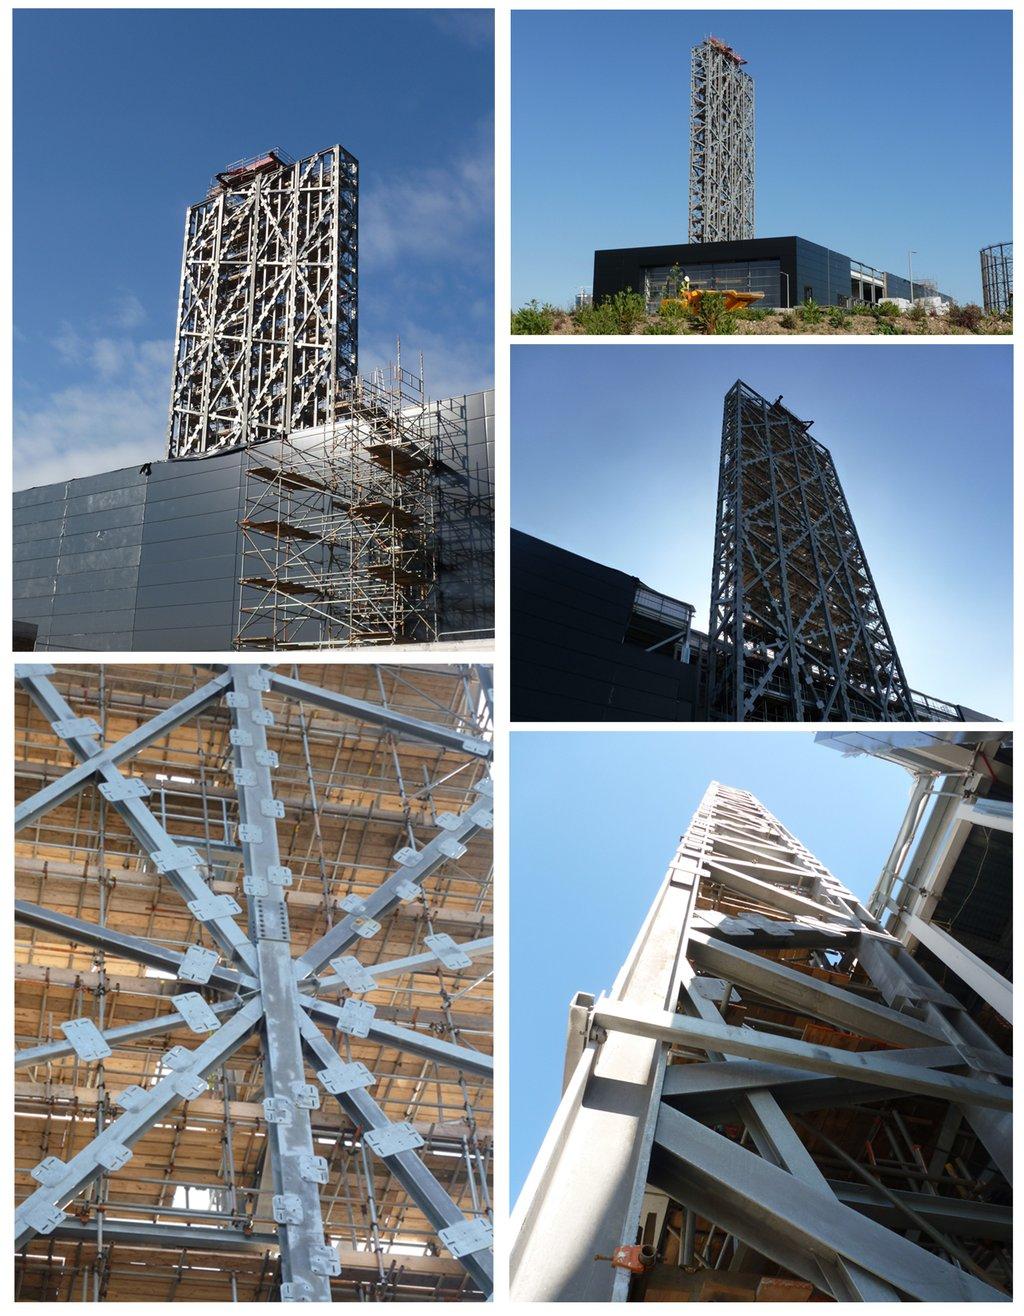 Billington Structures Ltd and Wedge Group Galvanizing [Billington Steel on  Twitter ]